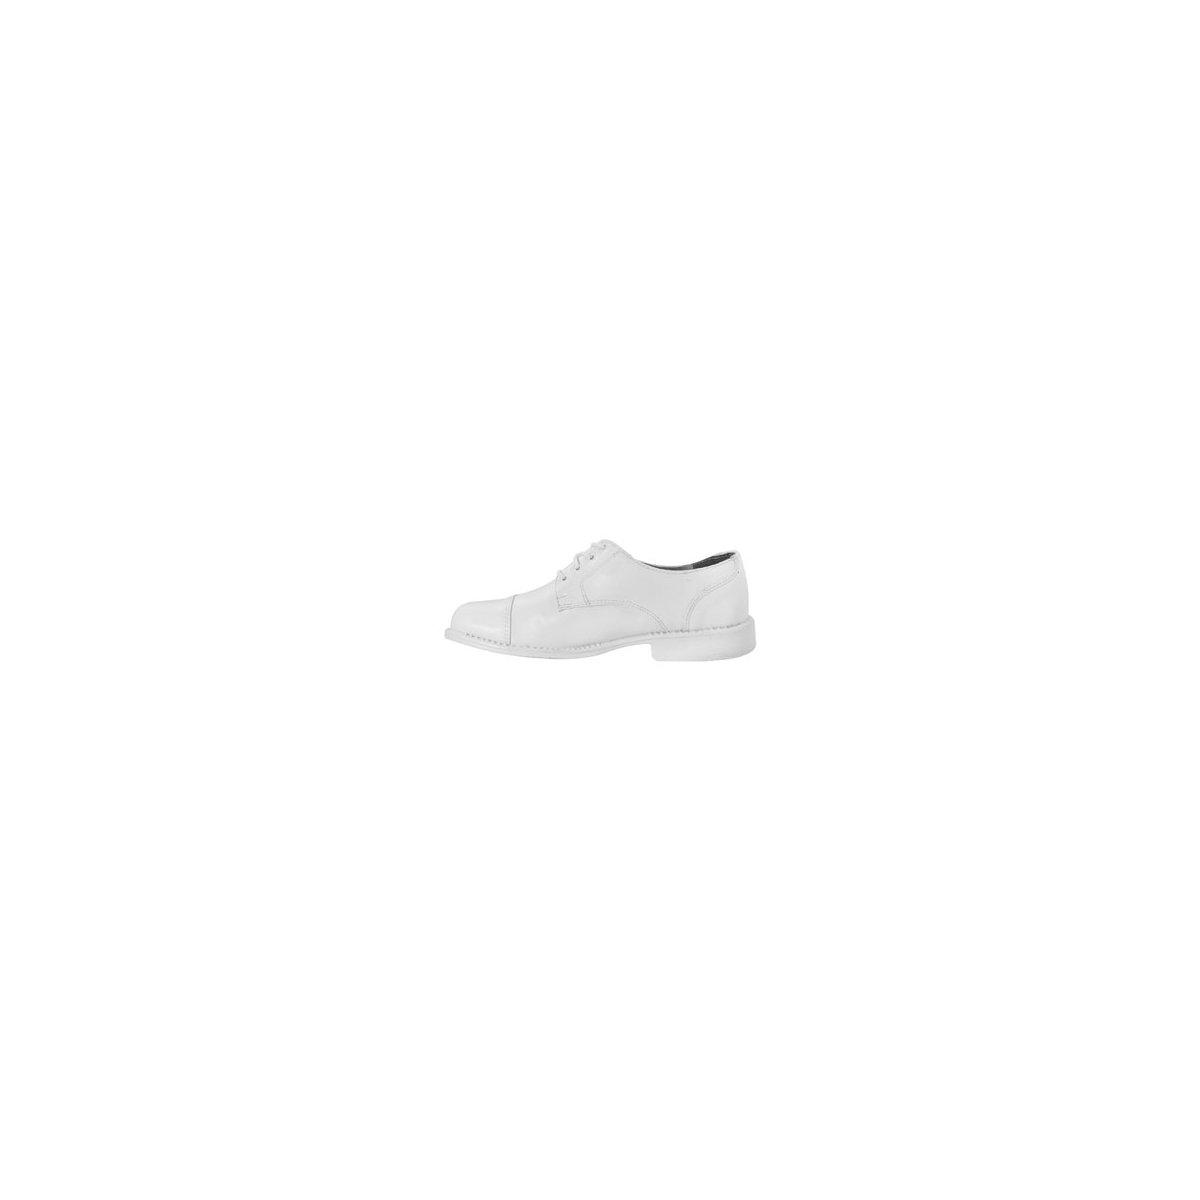 Social Sapato Social Sapato Social Sapato Dhomen Dhomen Branco Branco qwgaqft